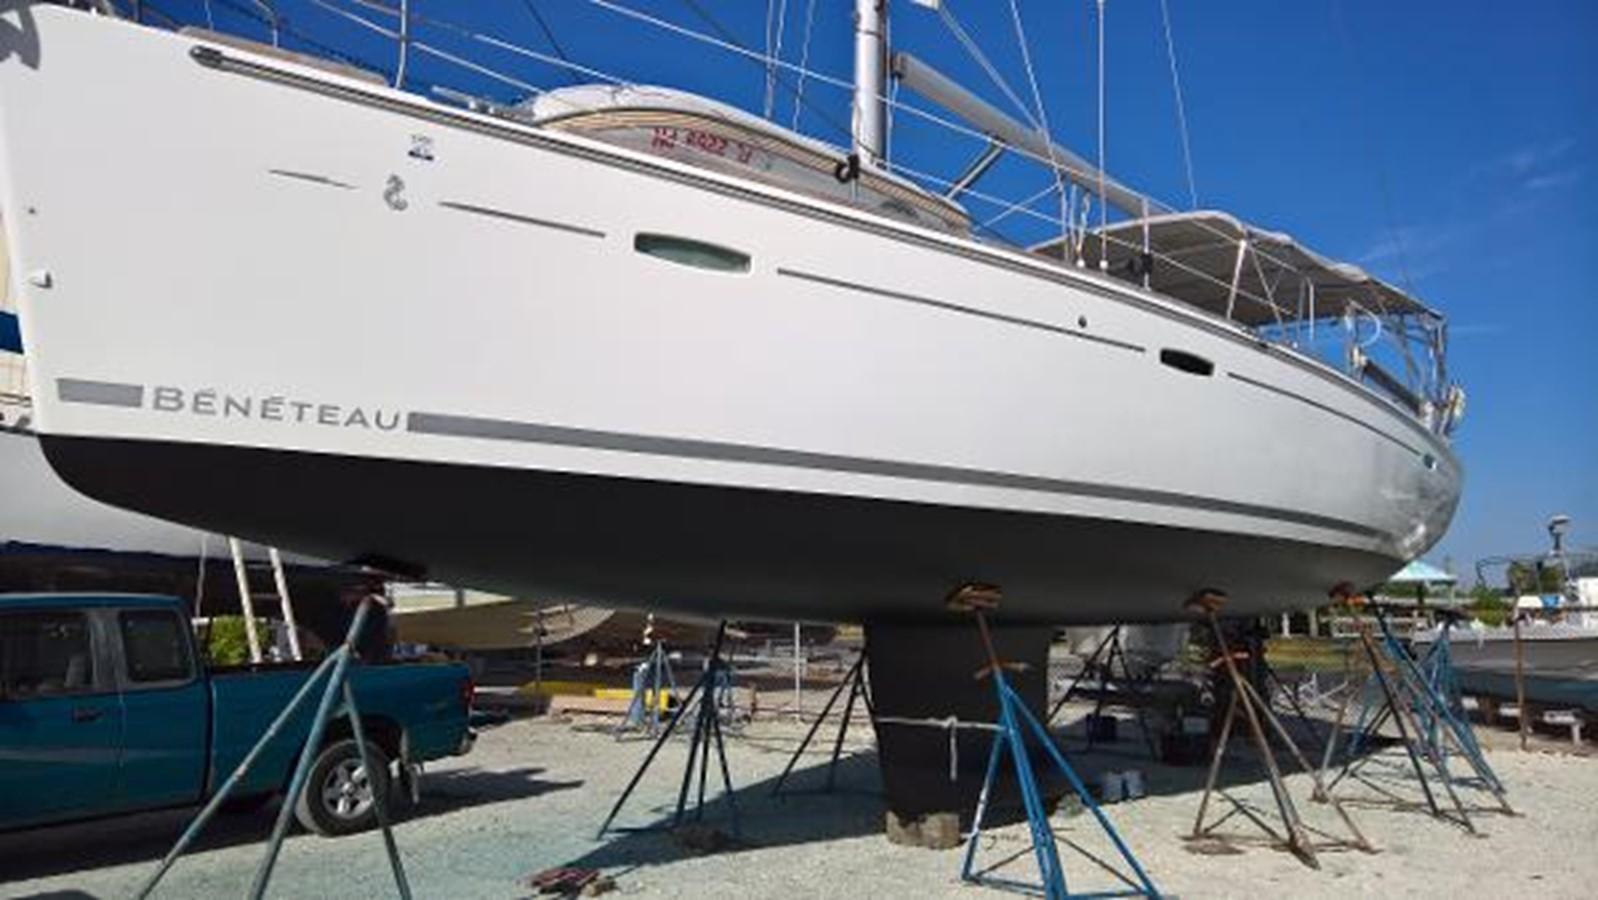 2008 BENETEAU Model Oceanis 43 Classic Yacht 2687135